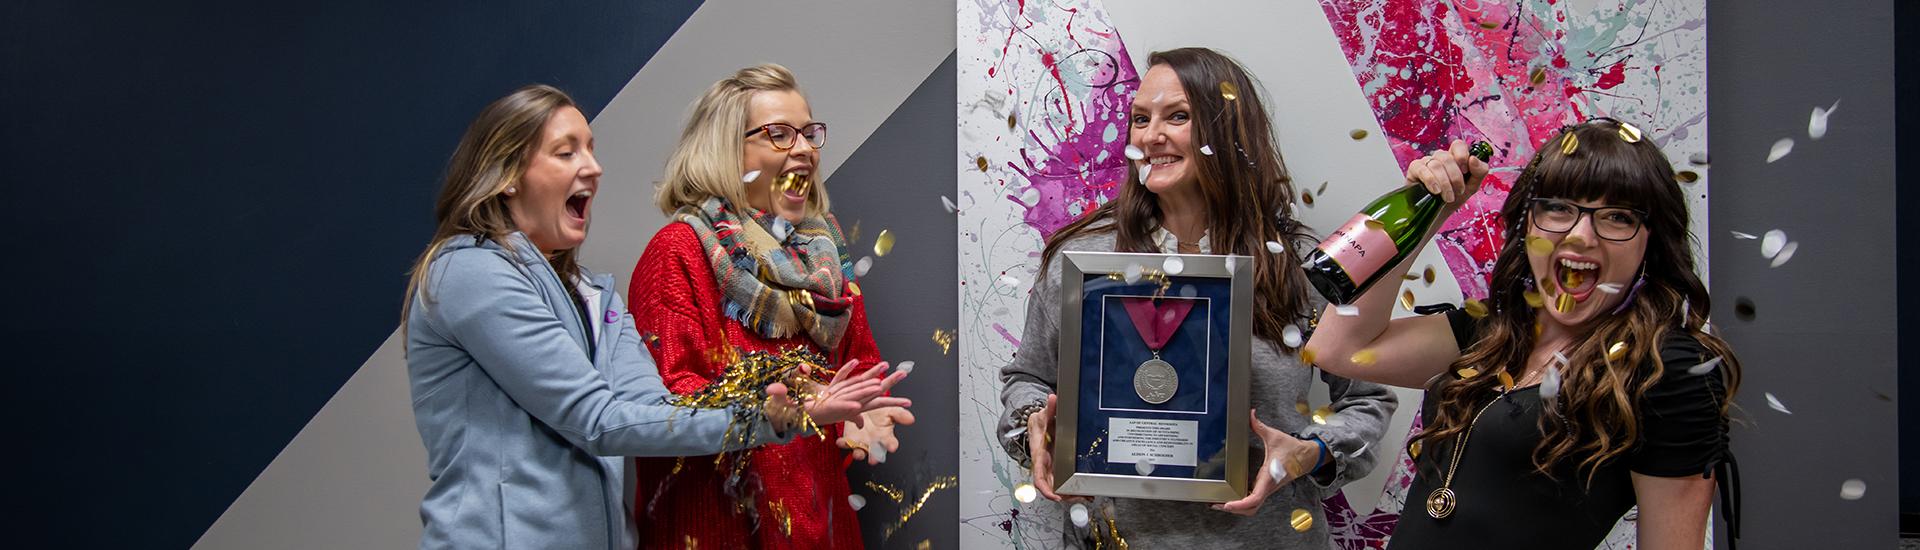 Alison Schroeder Wins Prestigious AAFCM Silver Medal Award